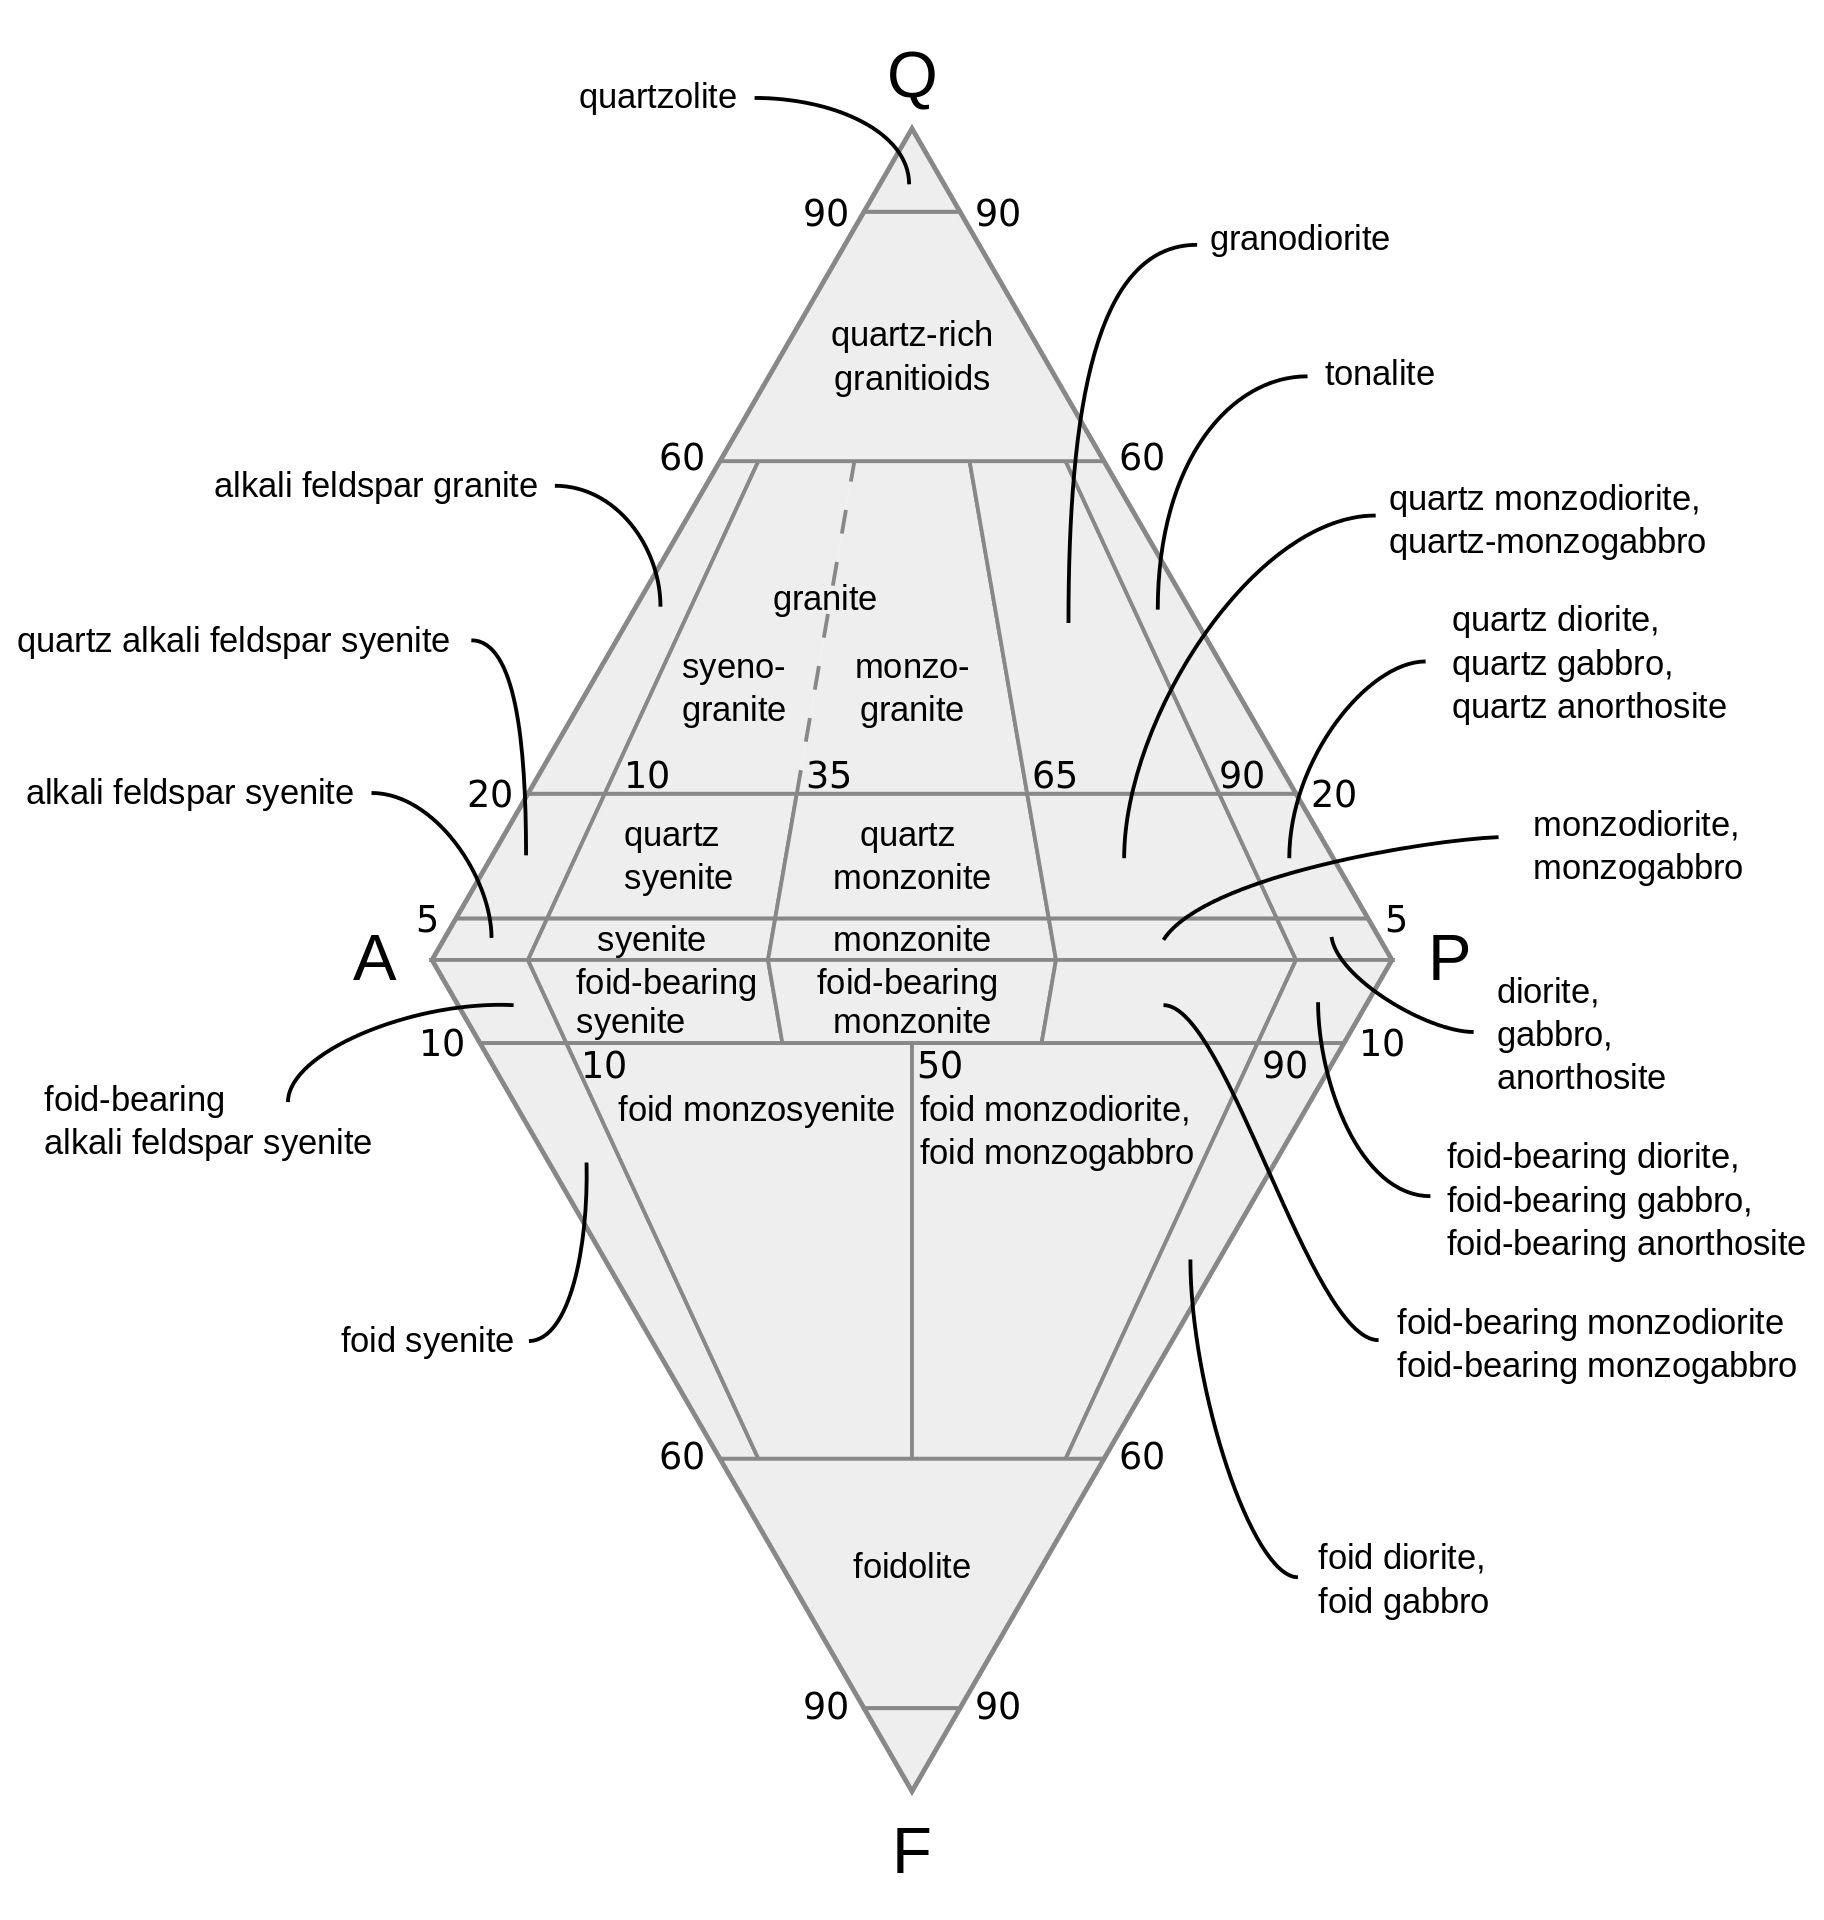 Qapf diagram for intrusive igneous rocks igneous qapf diagram for intrusive igneous rocks pooptronica Choice Image